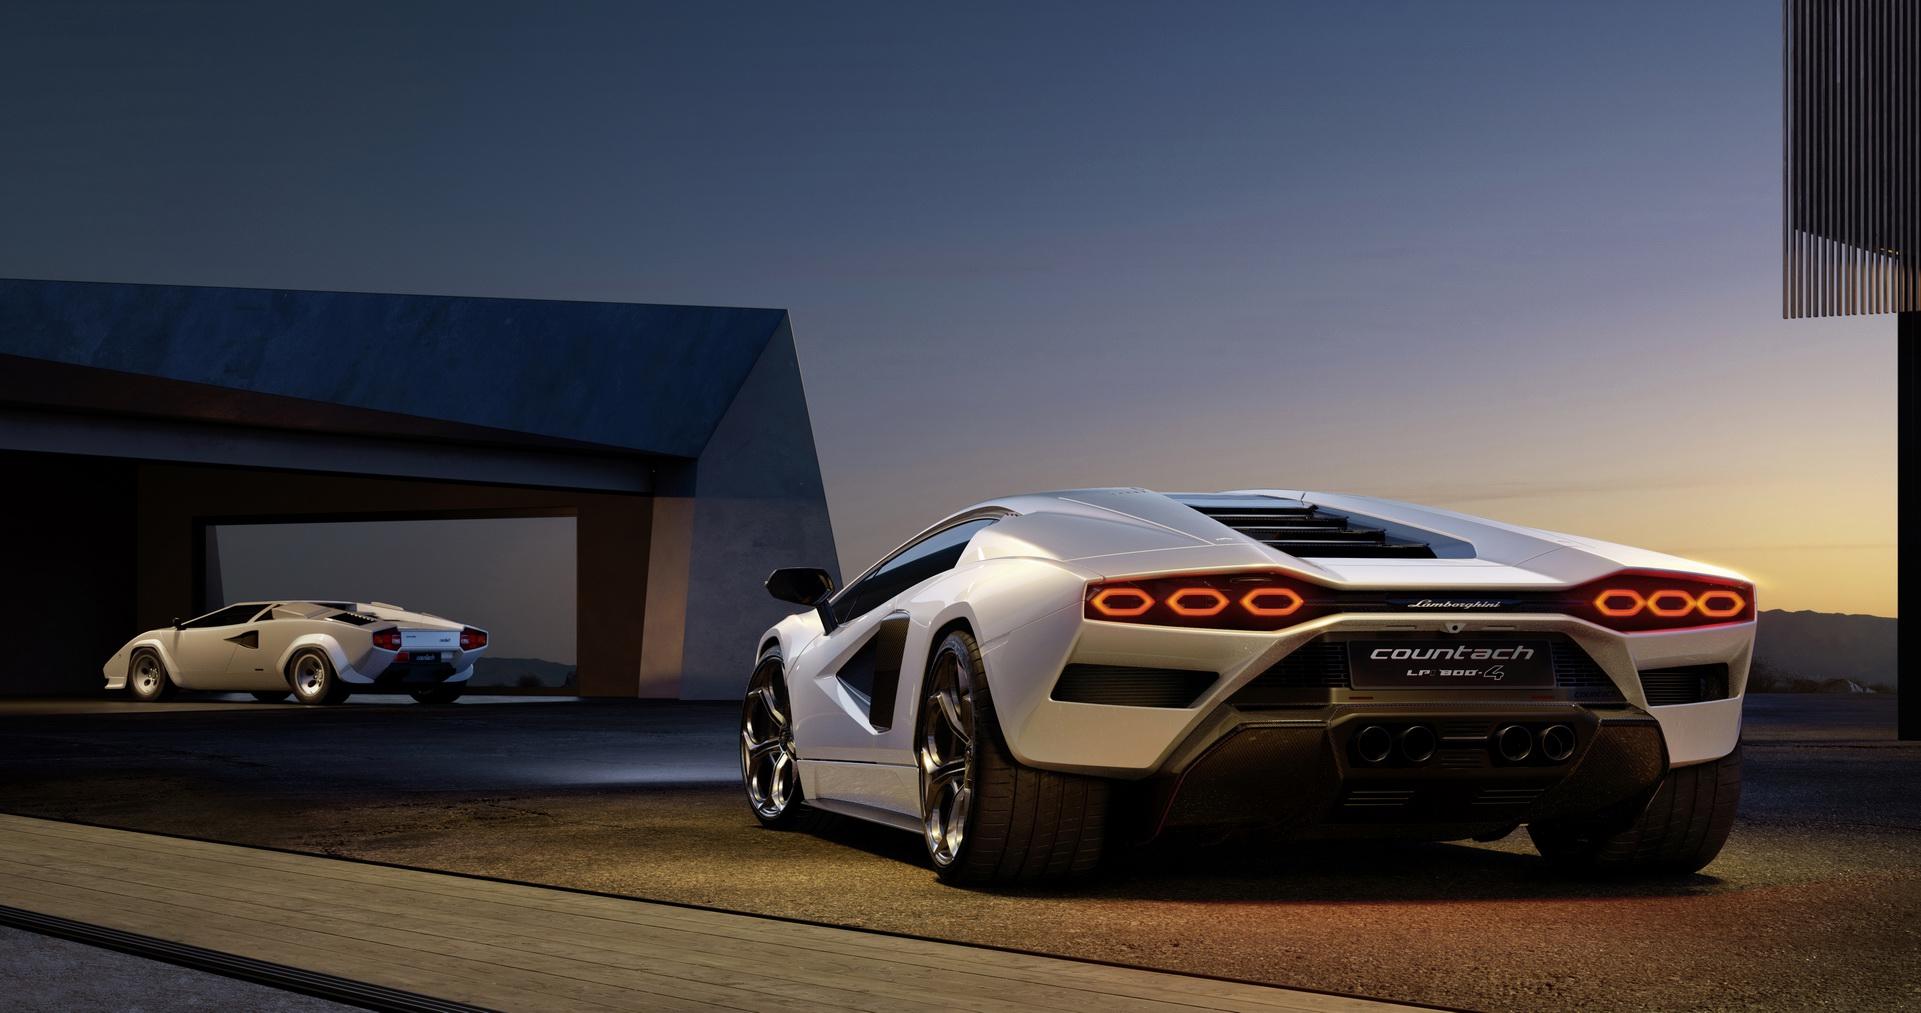 2022 Lamborghini Countach LPI 800-4 Rear Three-Quarter Wallpapers (3)